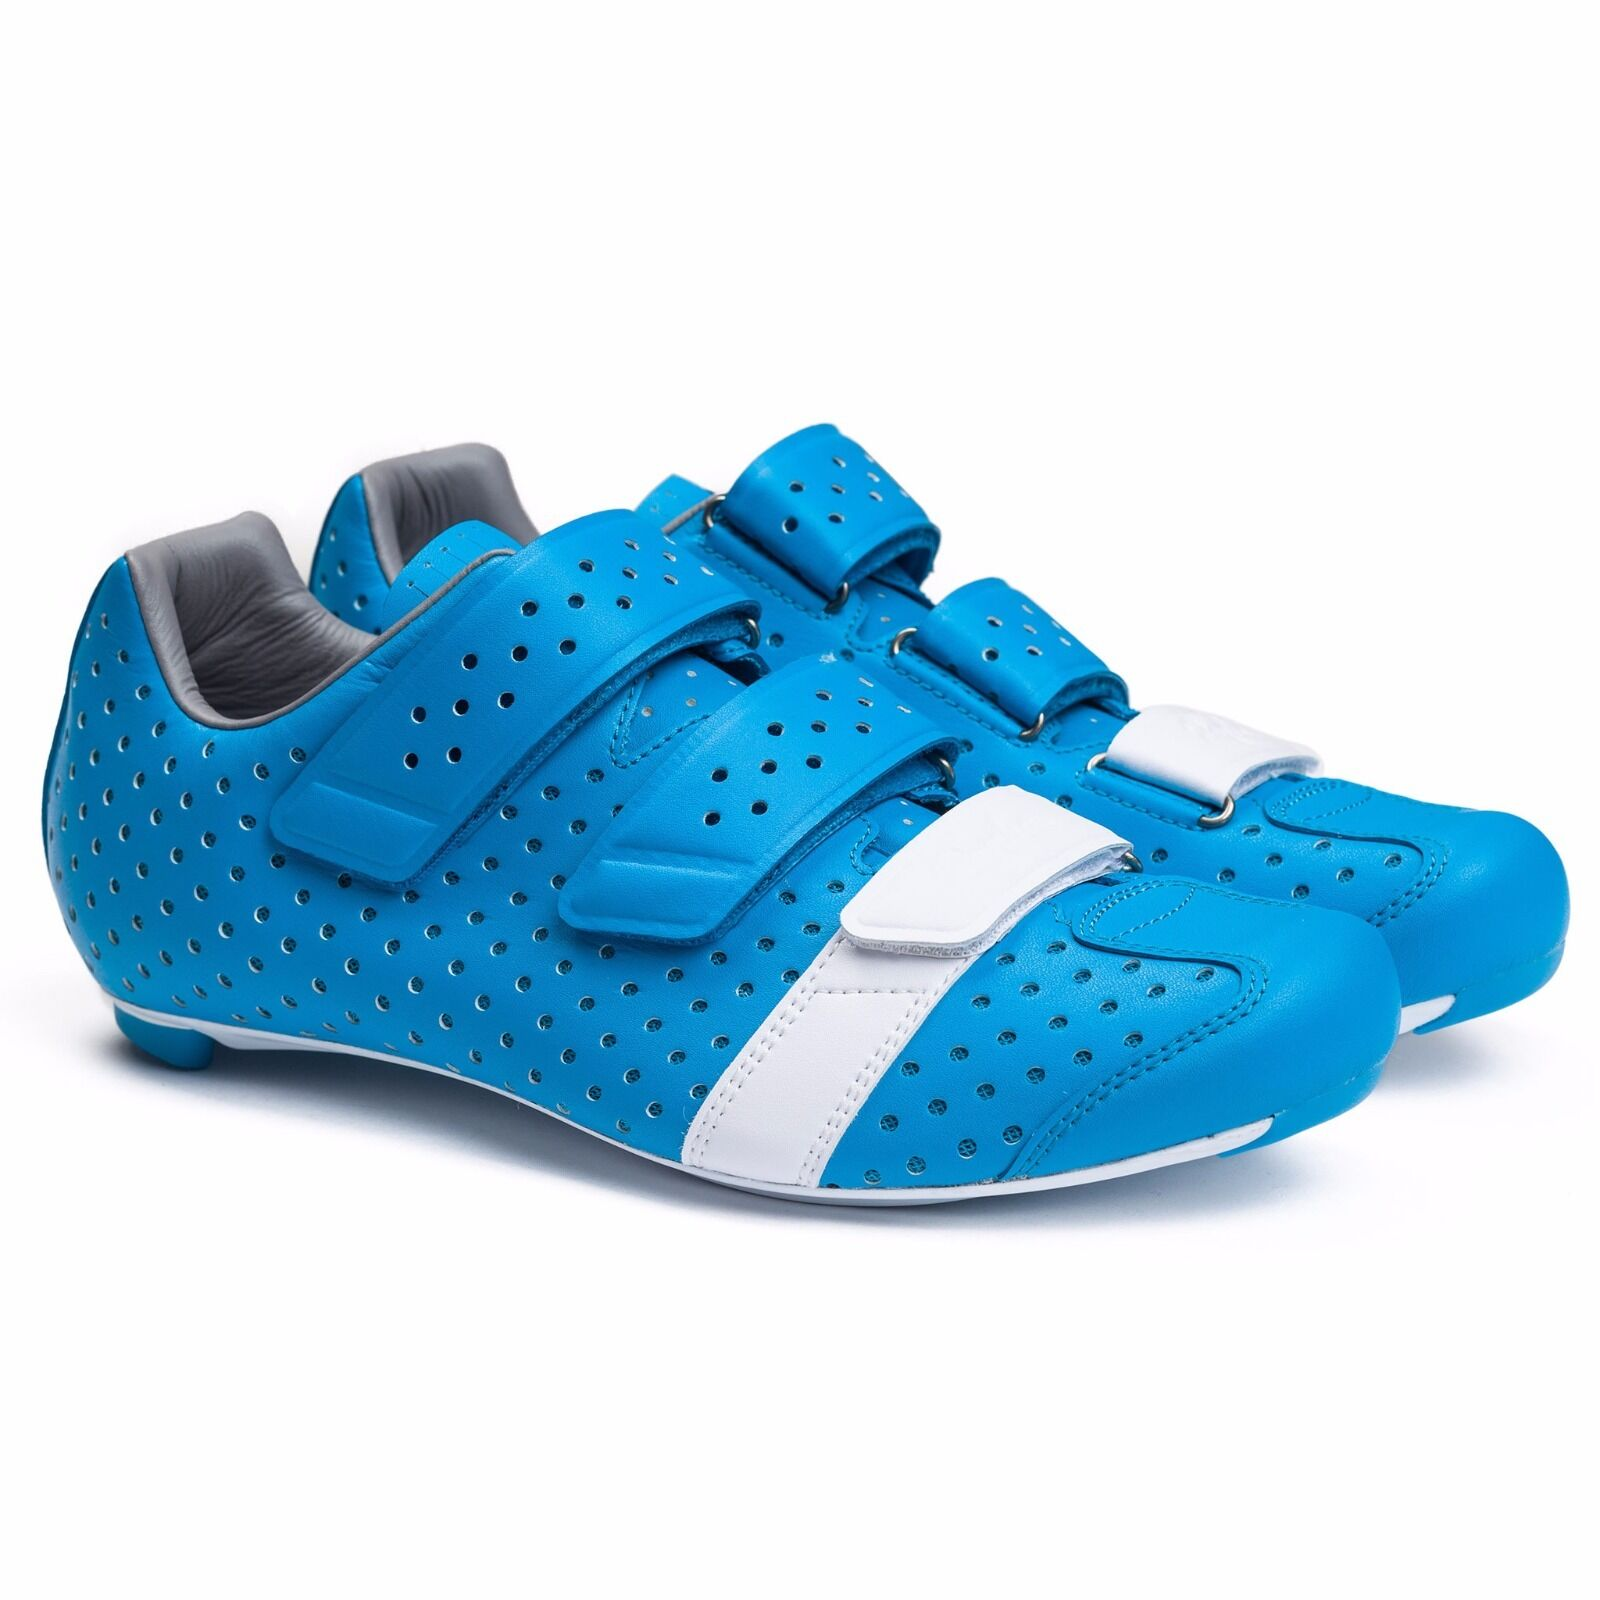 NEW Rapha Climber's TEAM SKY shoes Cycling 47 12 12.5  13 RCC Carbon Racing bluee  wholesale cheap